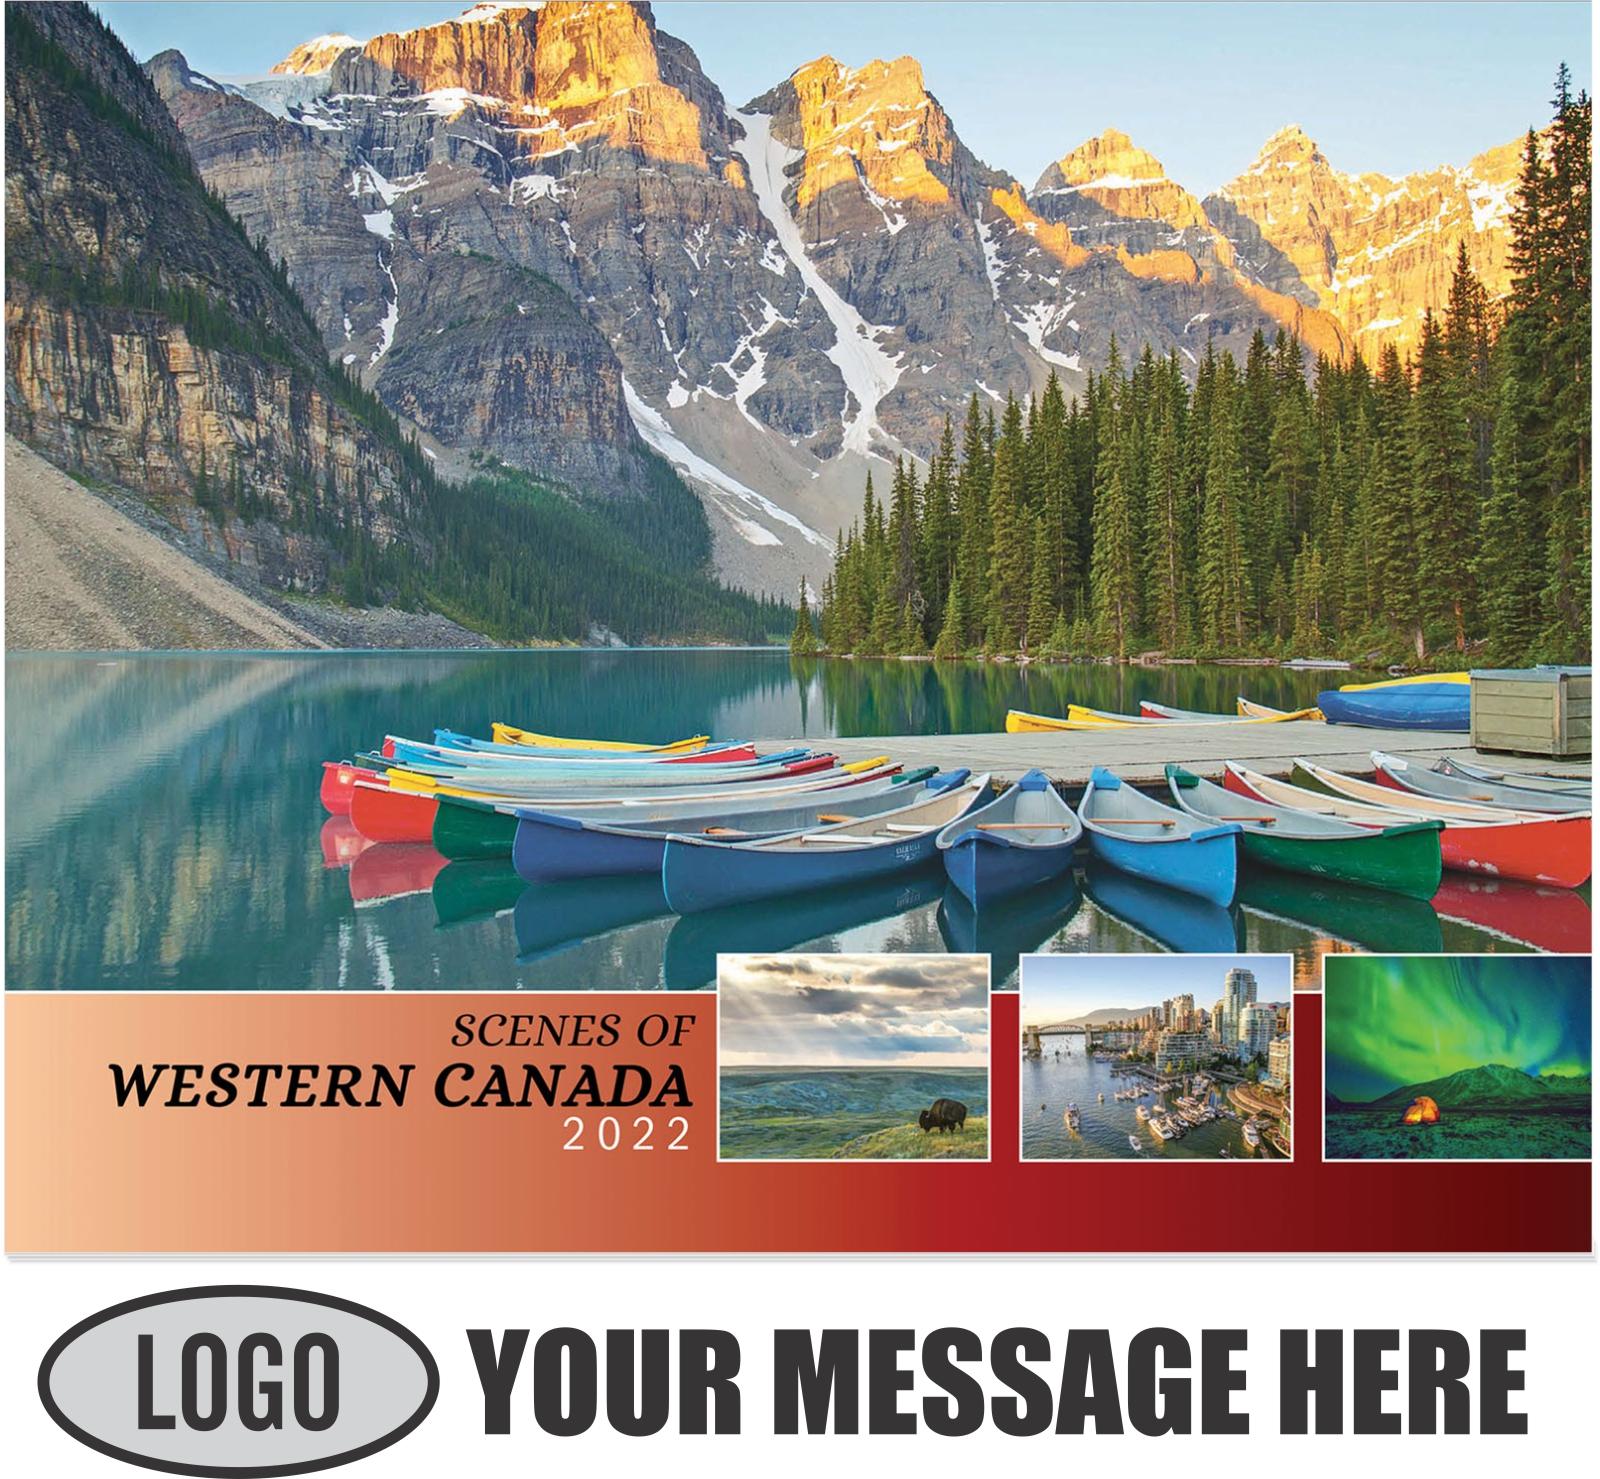 2022 Scenes of Western Canada Promotional Calendar